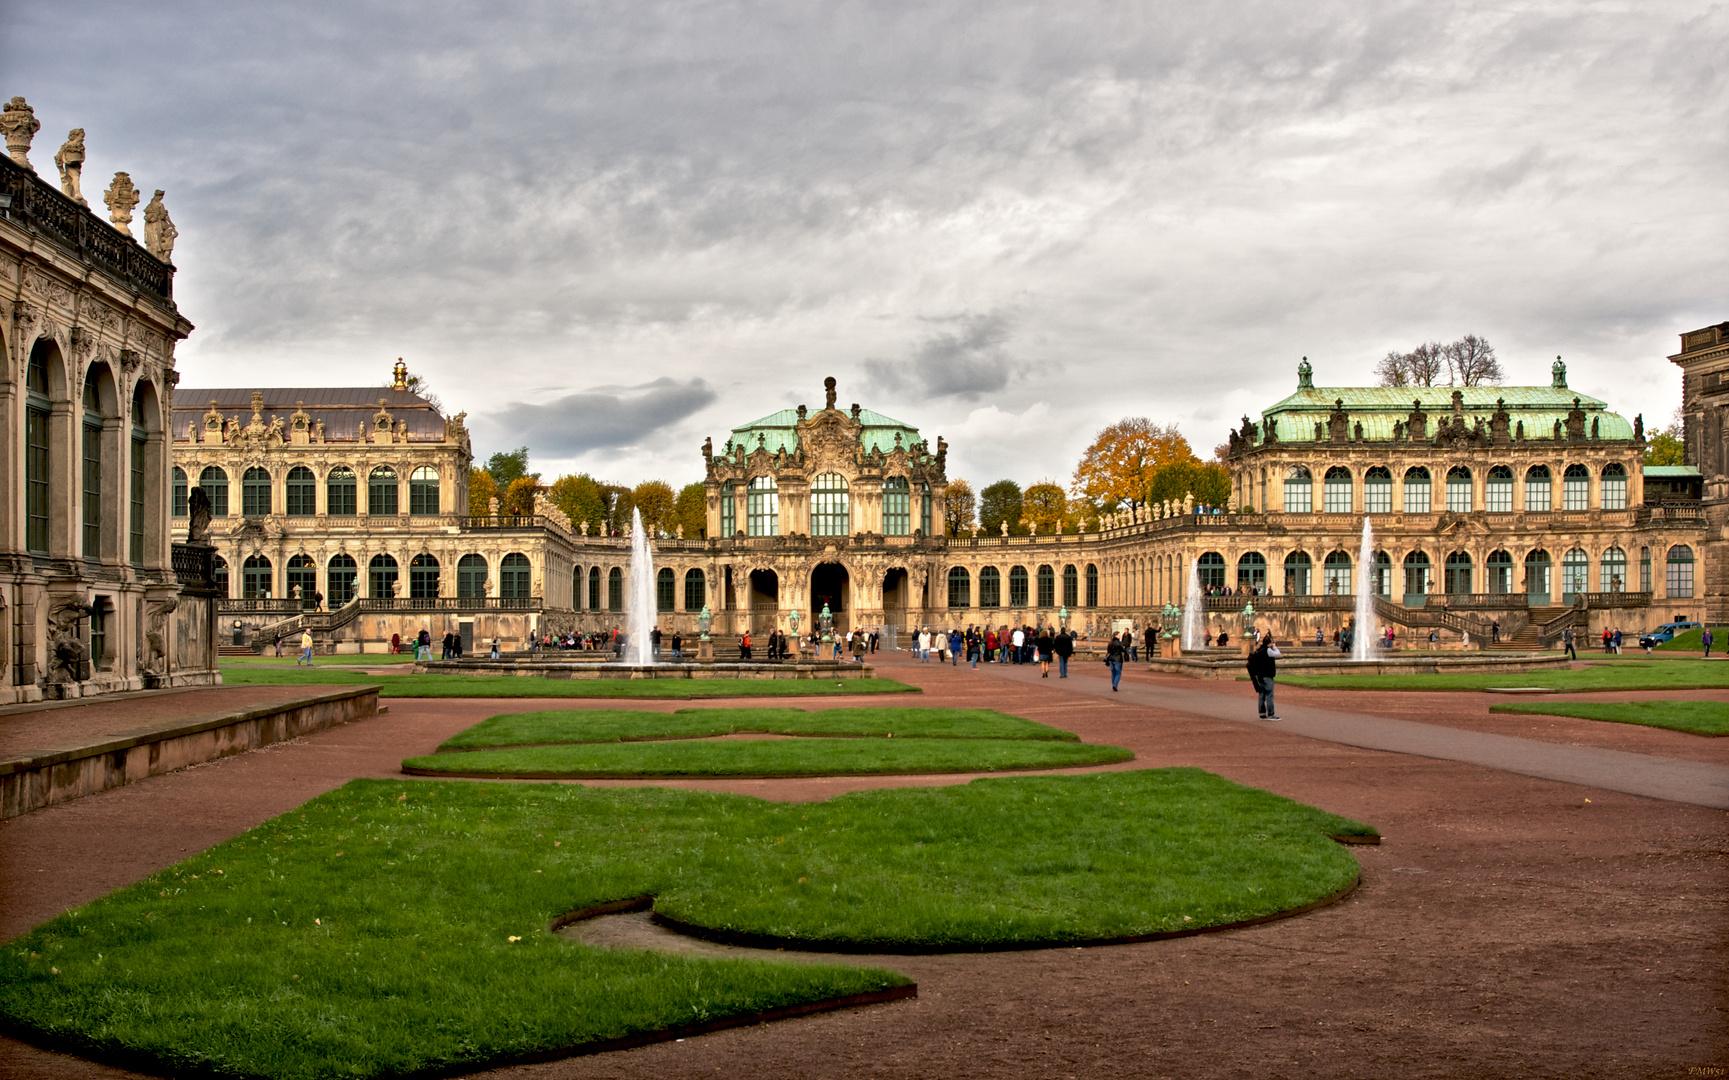 Oktoberwetter über dem Dresdner Zwinger